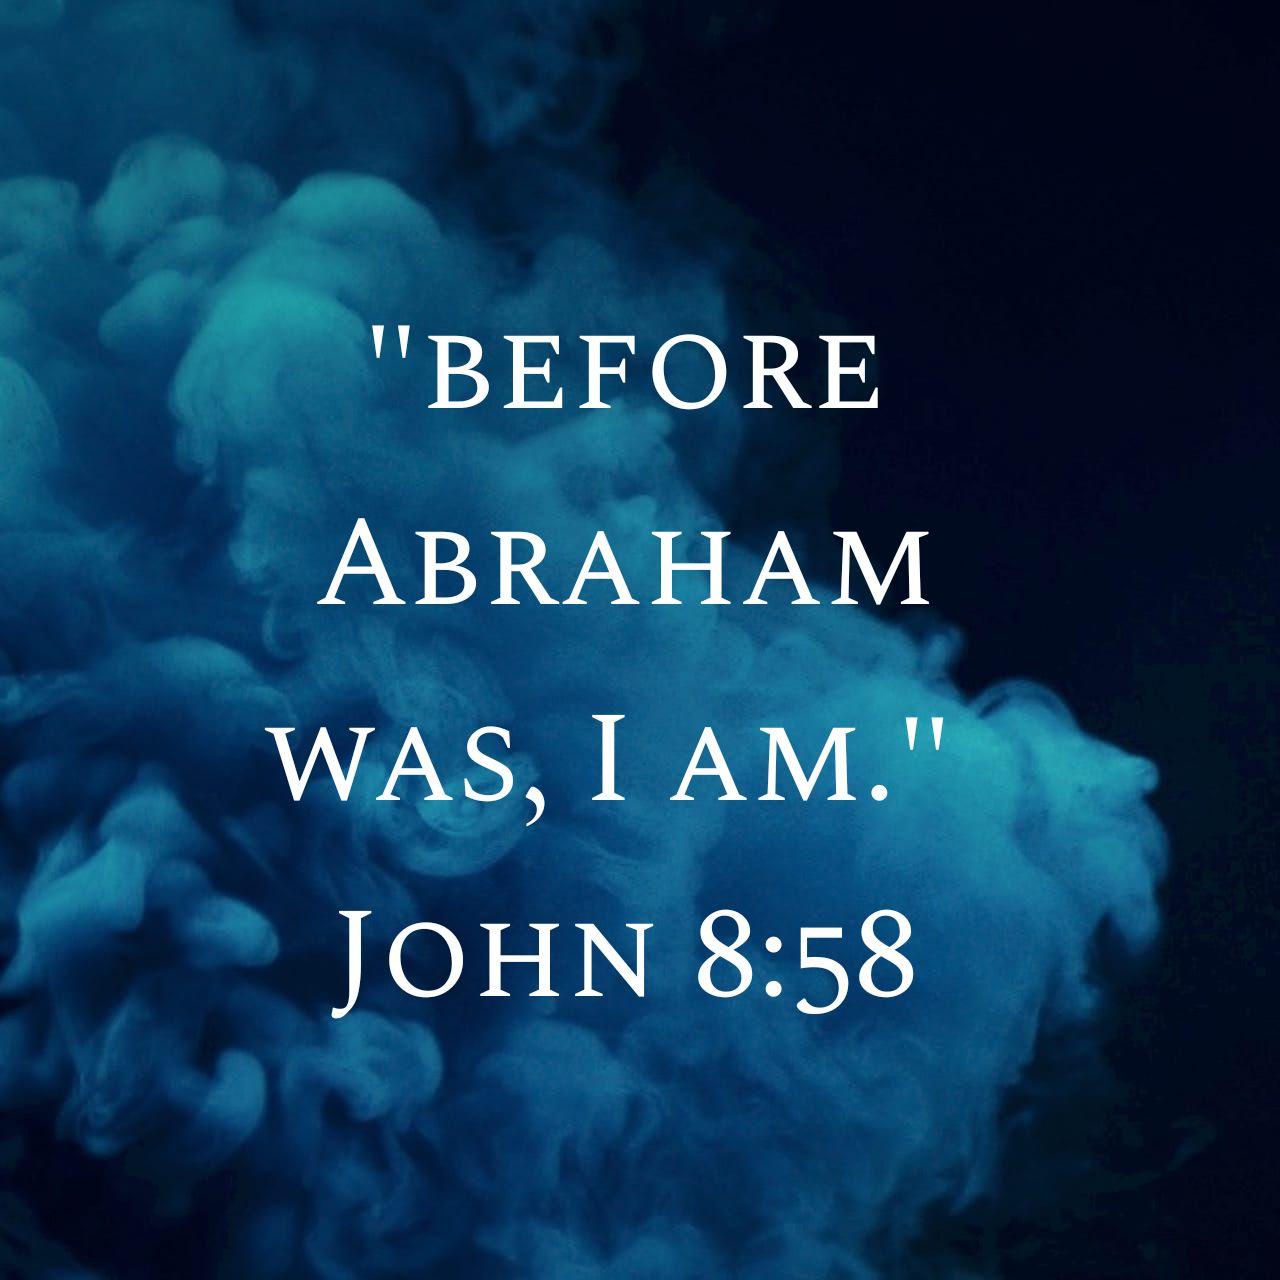 Daily Bible Reading: John 8:37-59